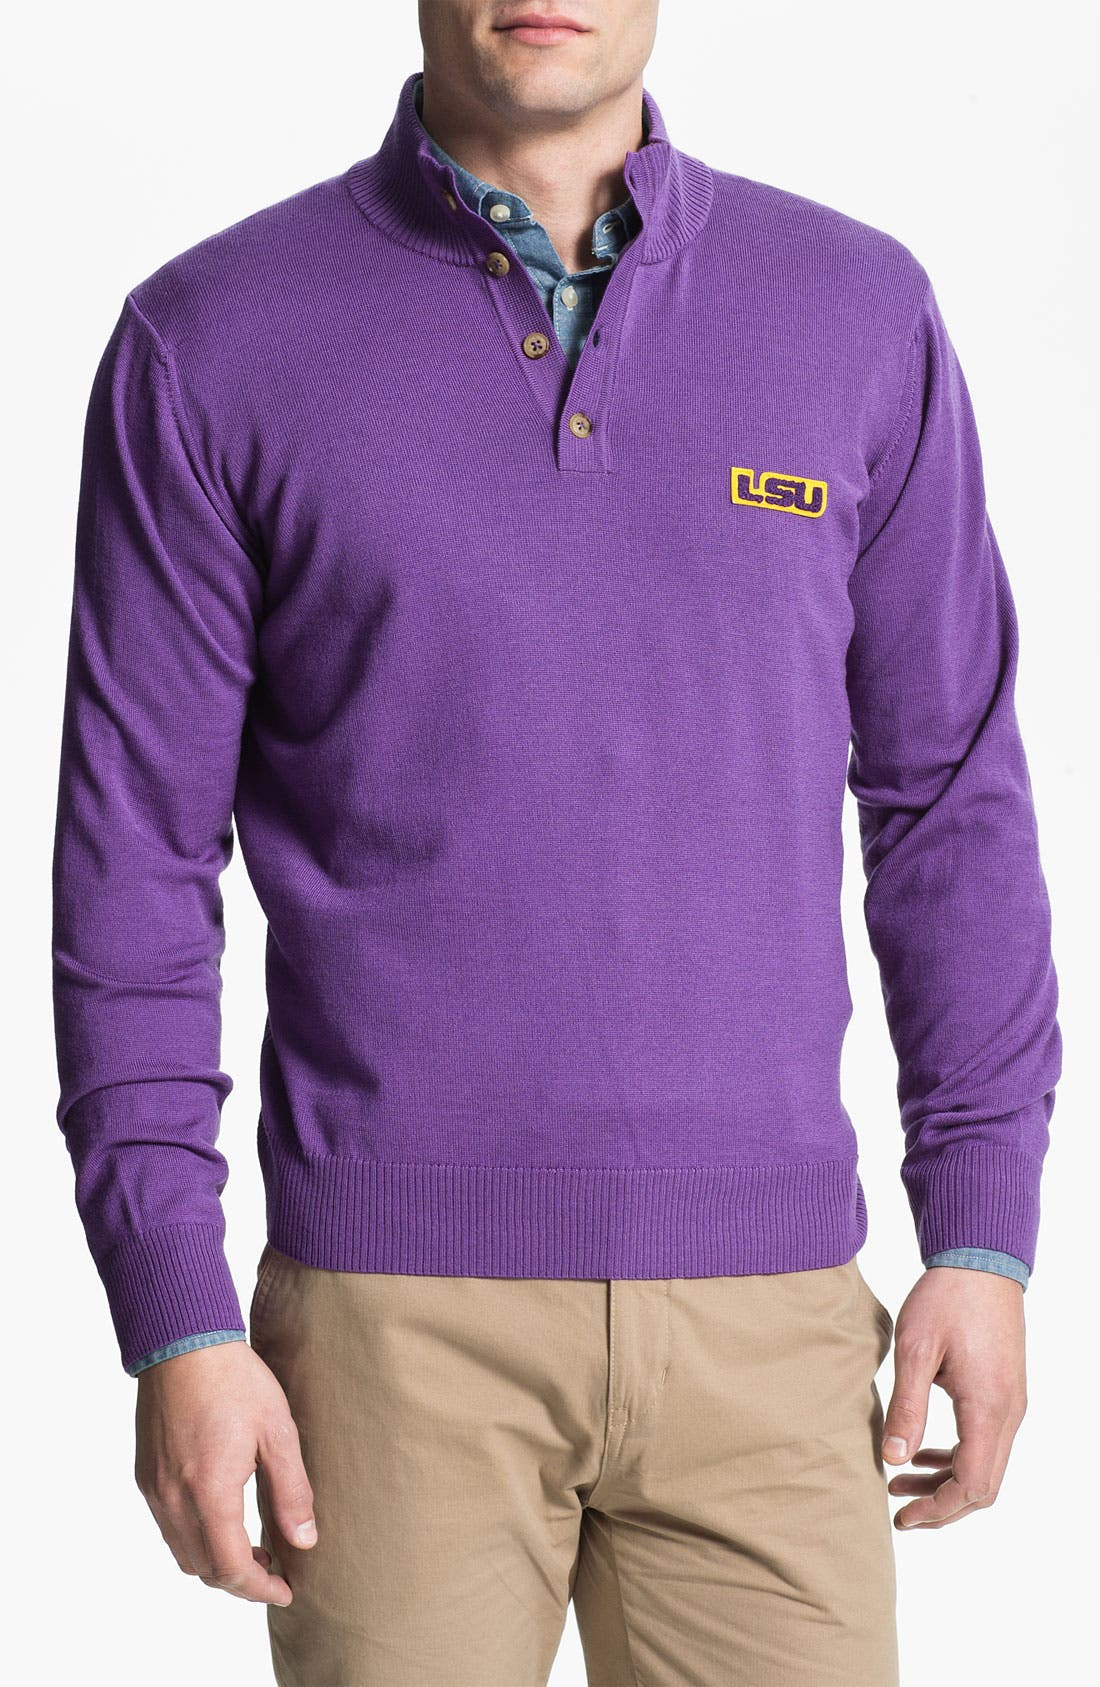 Alternate Image 1 Selected - Thomas Dean 'Louisiana State University' Wool Sweater